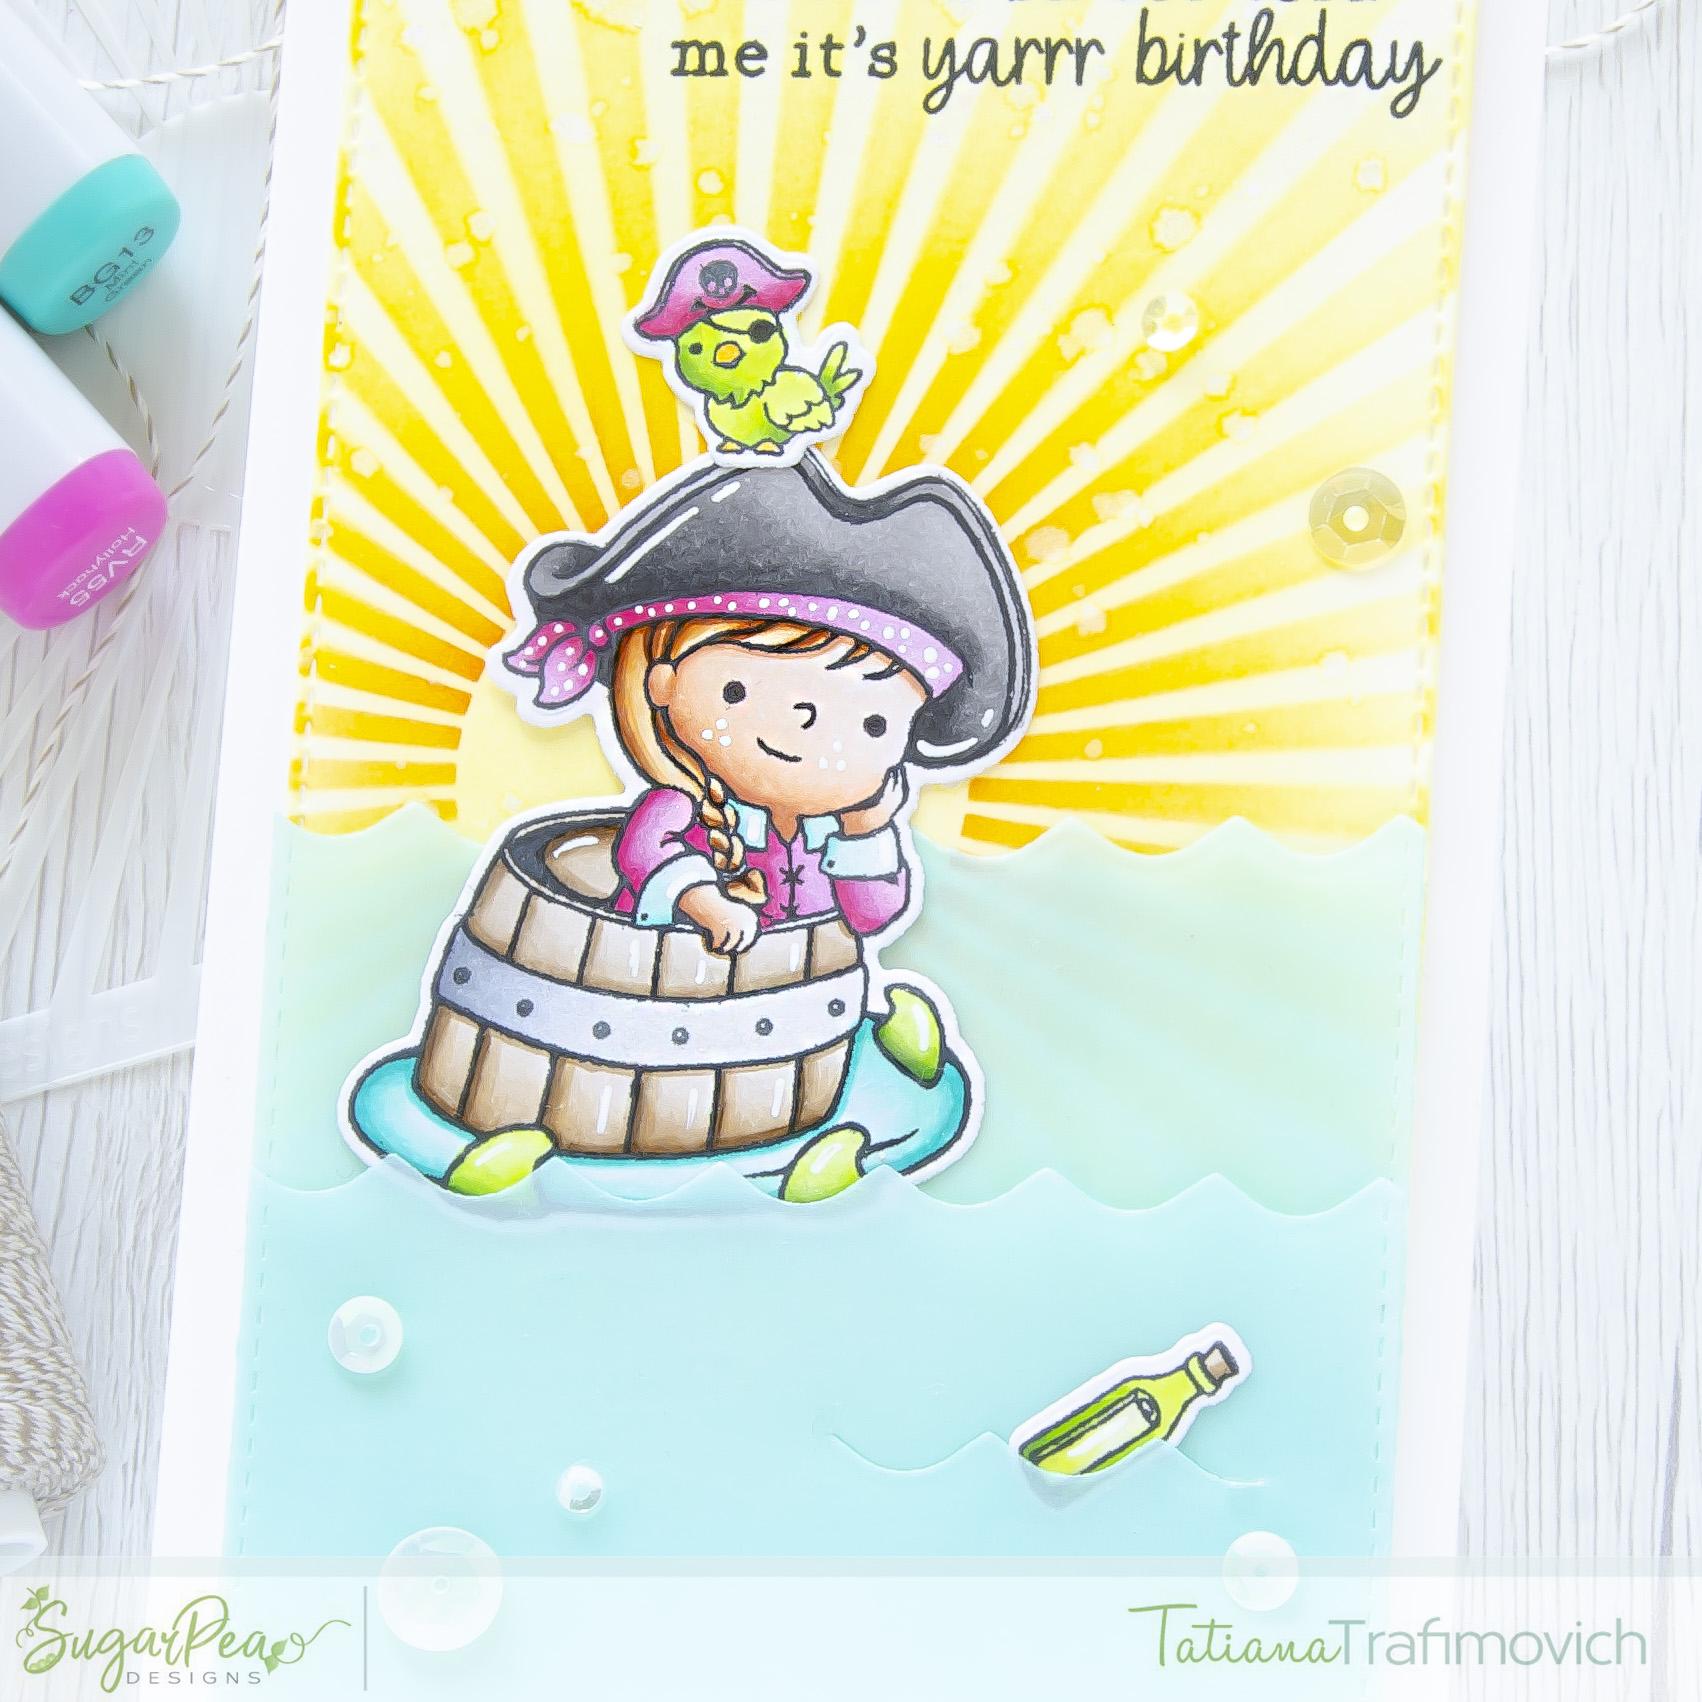 It's Yarrr Birthday #handmade card by Tatiana Trafimovich #tatianacraftandart - Captain of My Heart stamp set by SugarPea Designs #sugarpeadesigns